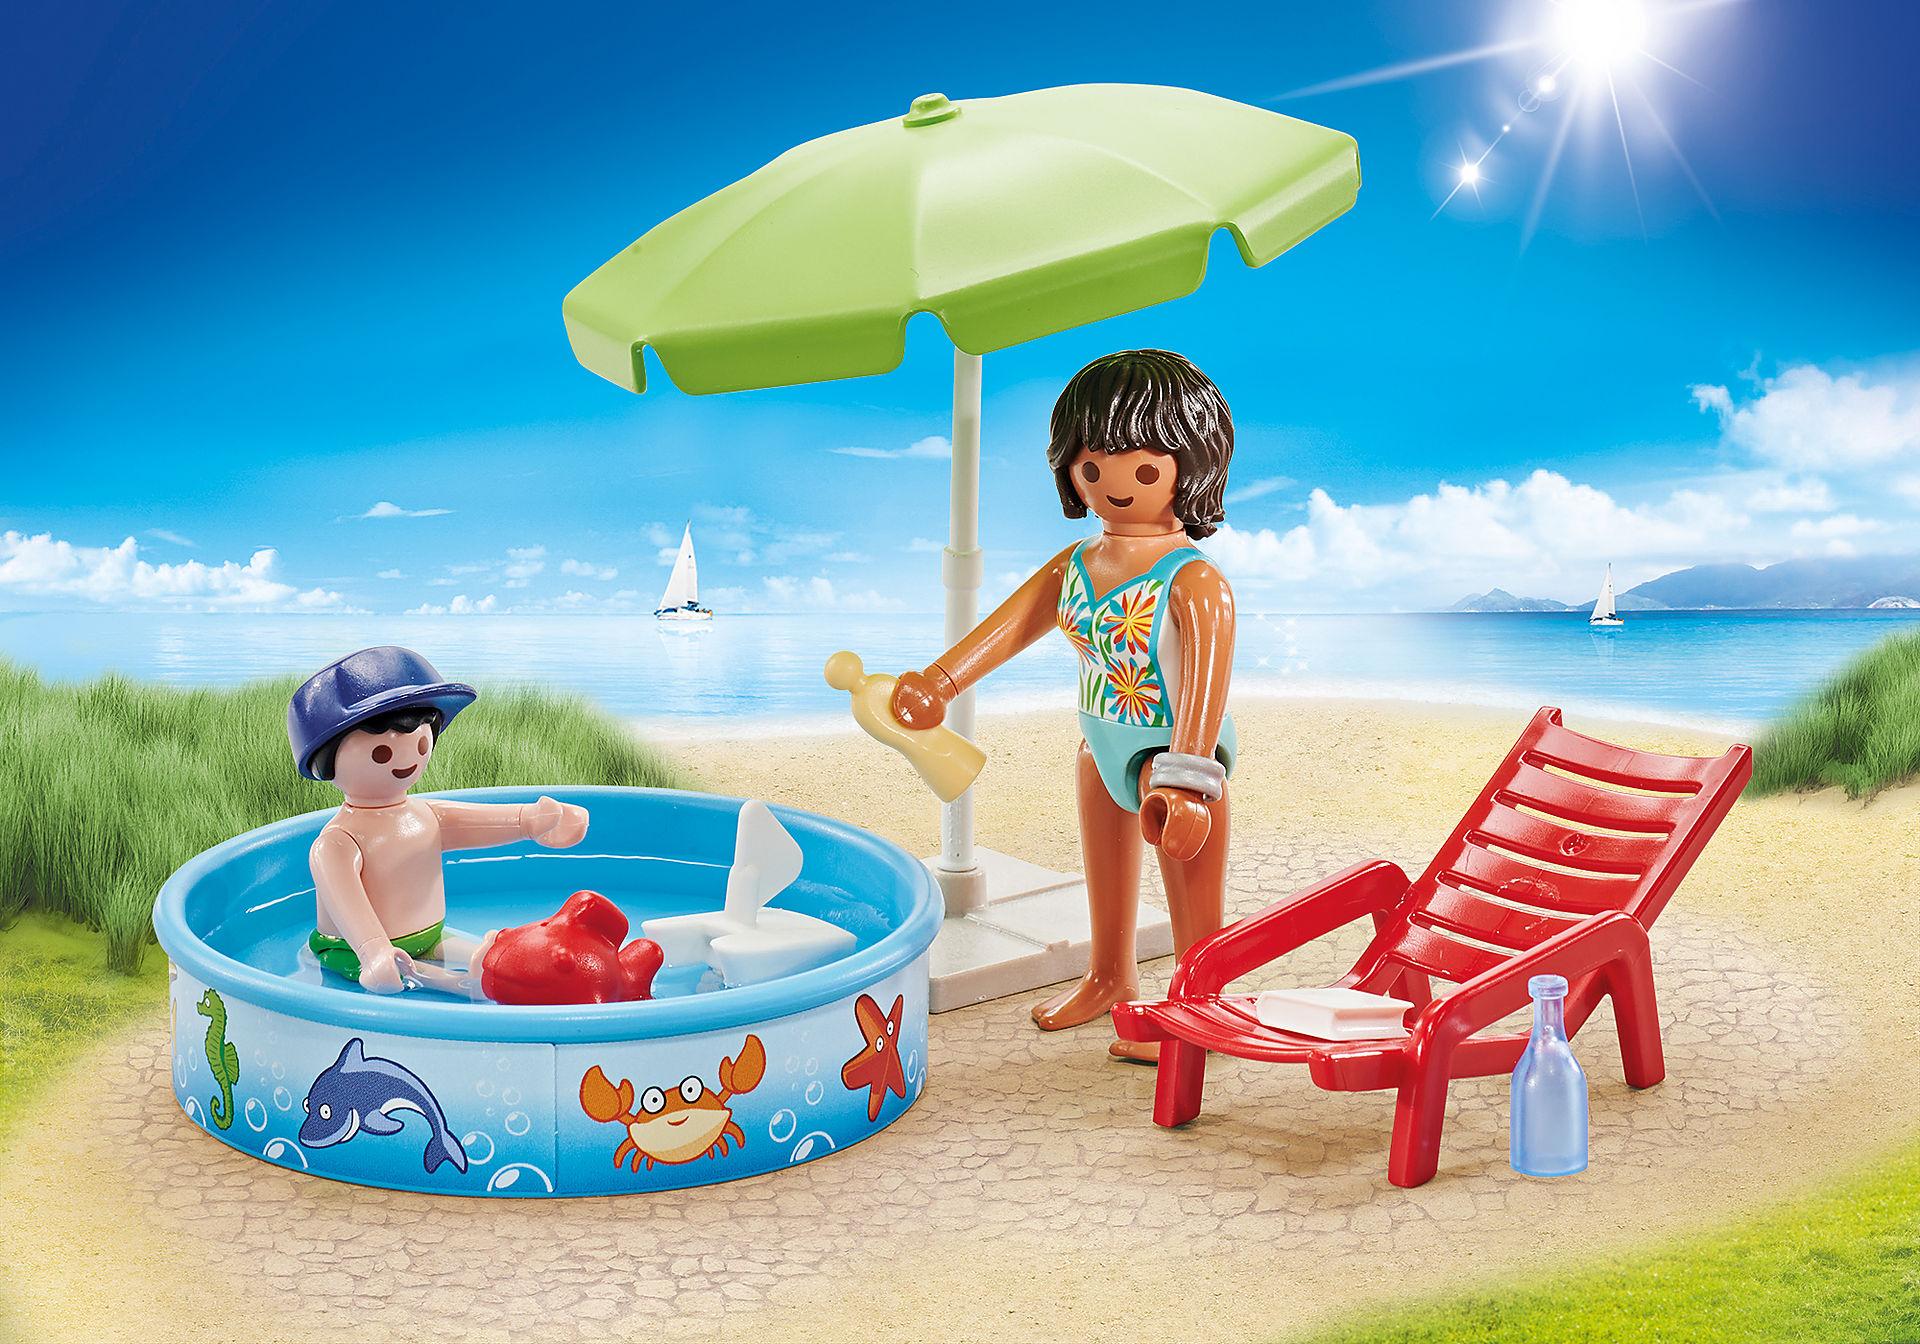 9862 4 seizoenen zomer zoom image1